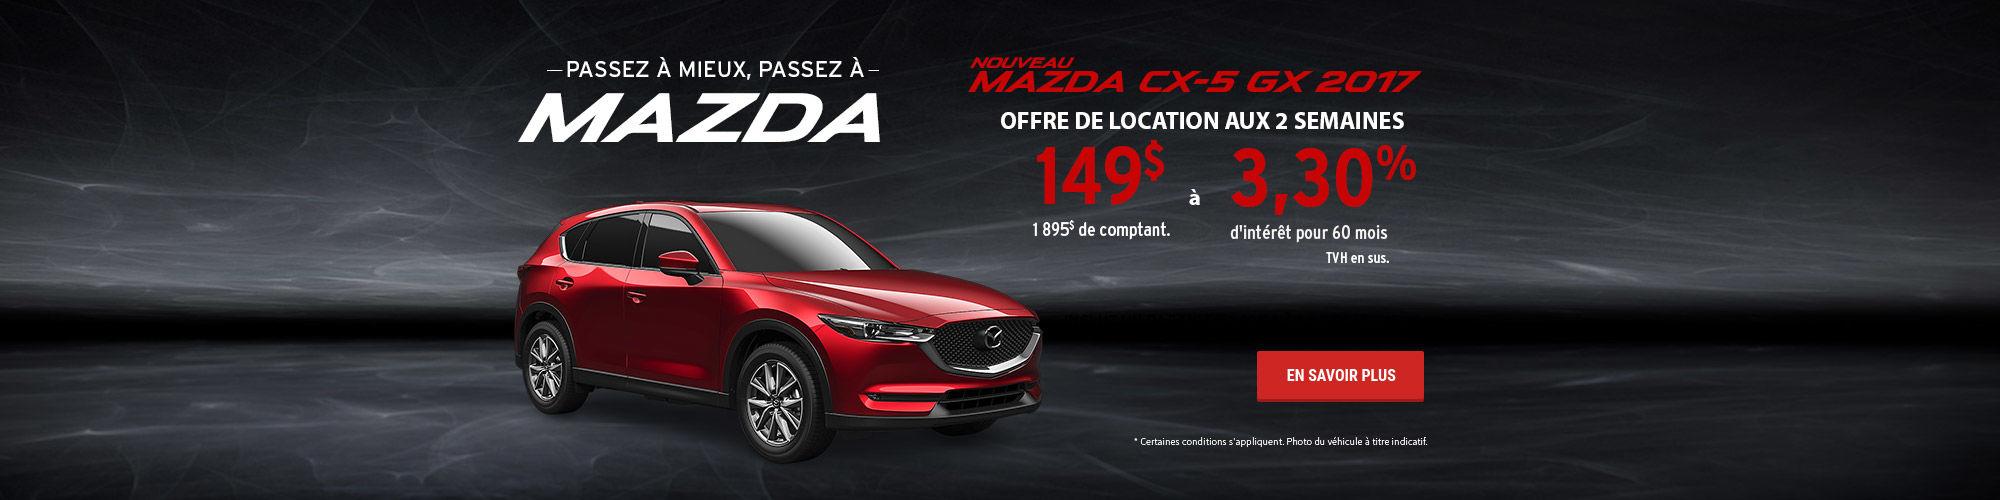 Passez à mieux, passez à Mazda - CX-5